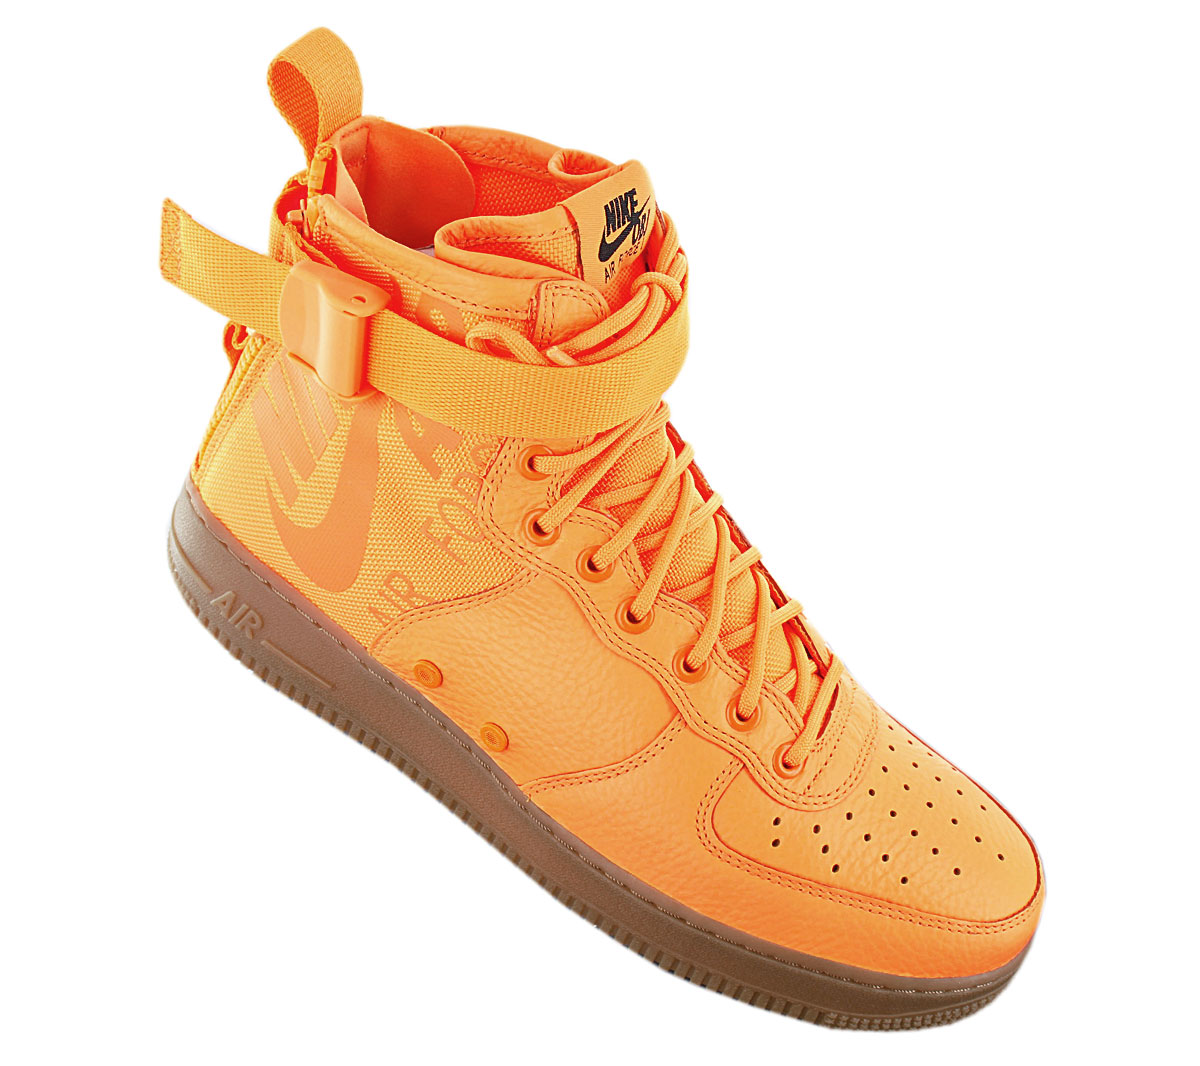 Details zu Nike SF AIR FORCE 1 MID OBJ 917753 801 Herren Sneaker Orange Turnschuhe NEU